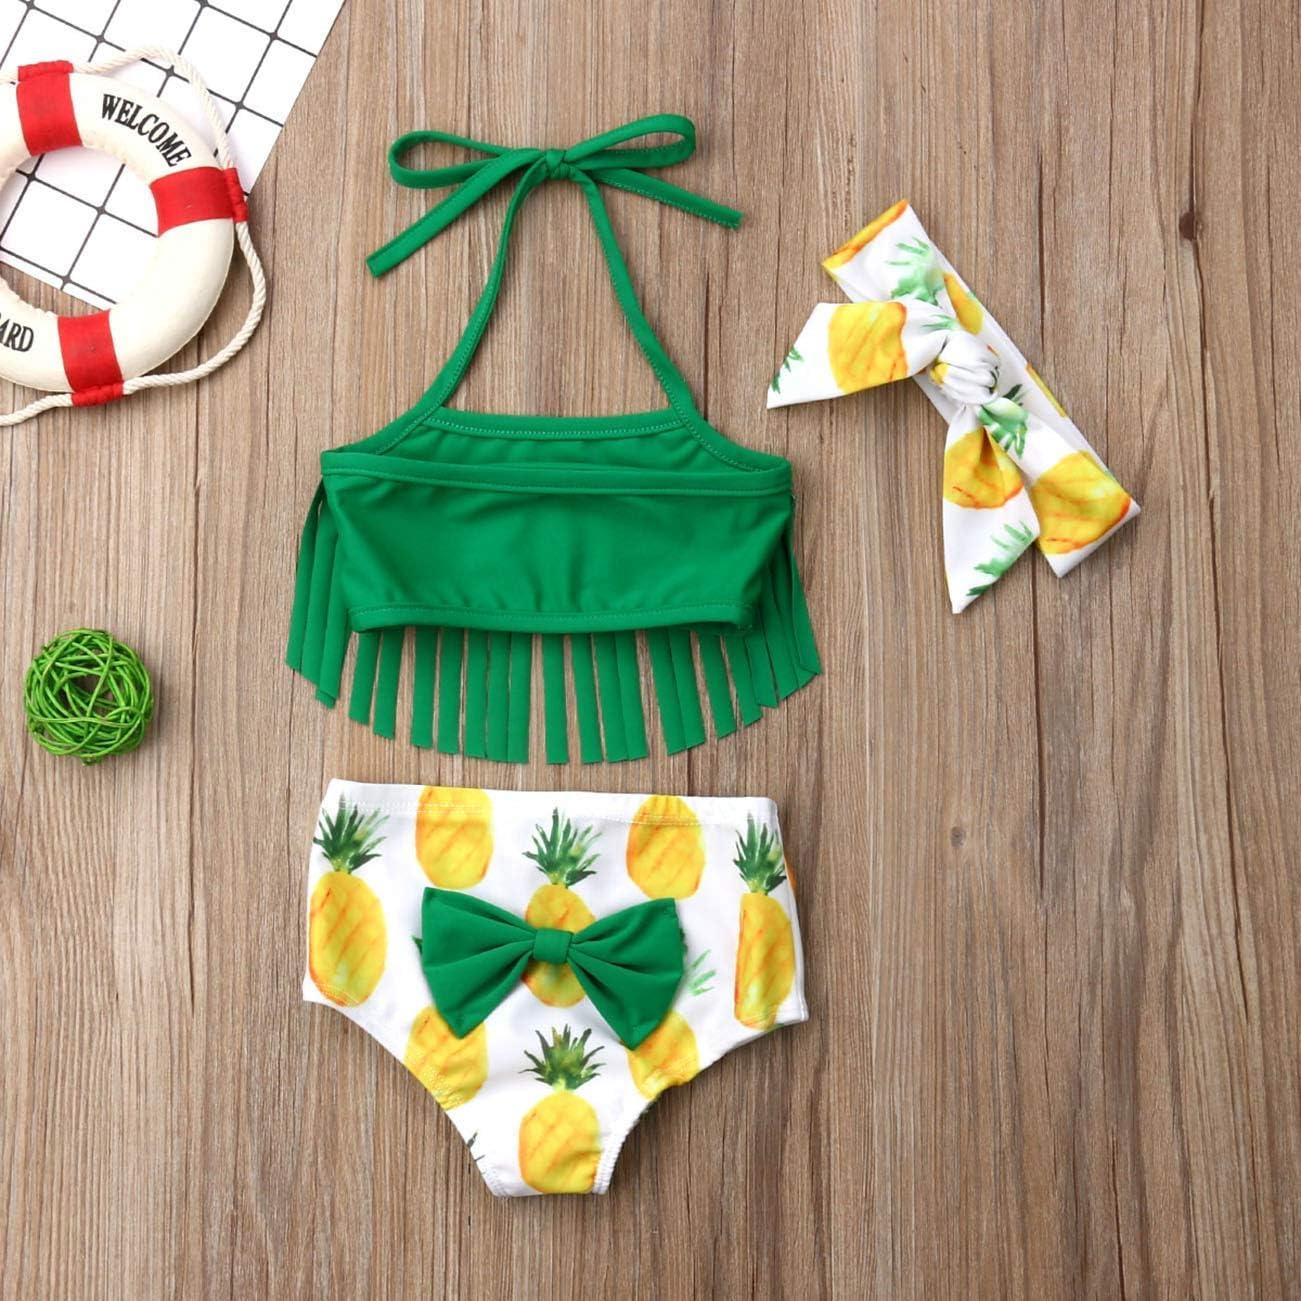 Patricks Day Green Bathing Suit 3Pcs Infant Baby Girls Halter Neck Tassel Swimsuit Pineapple Shorts Top Headband St